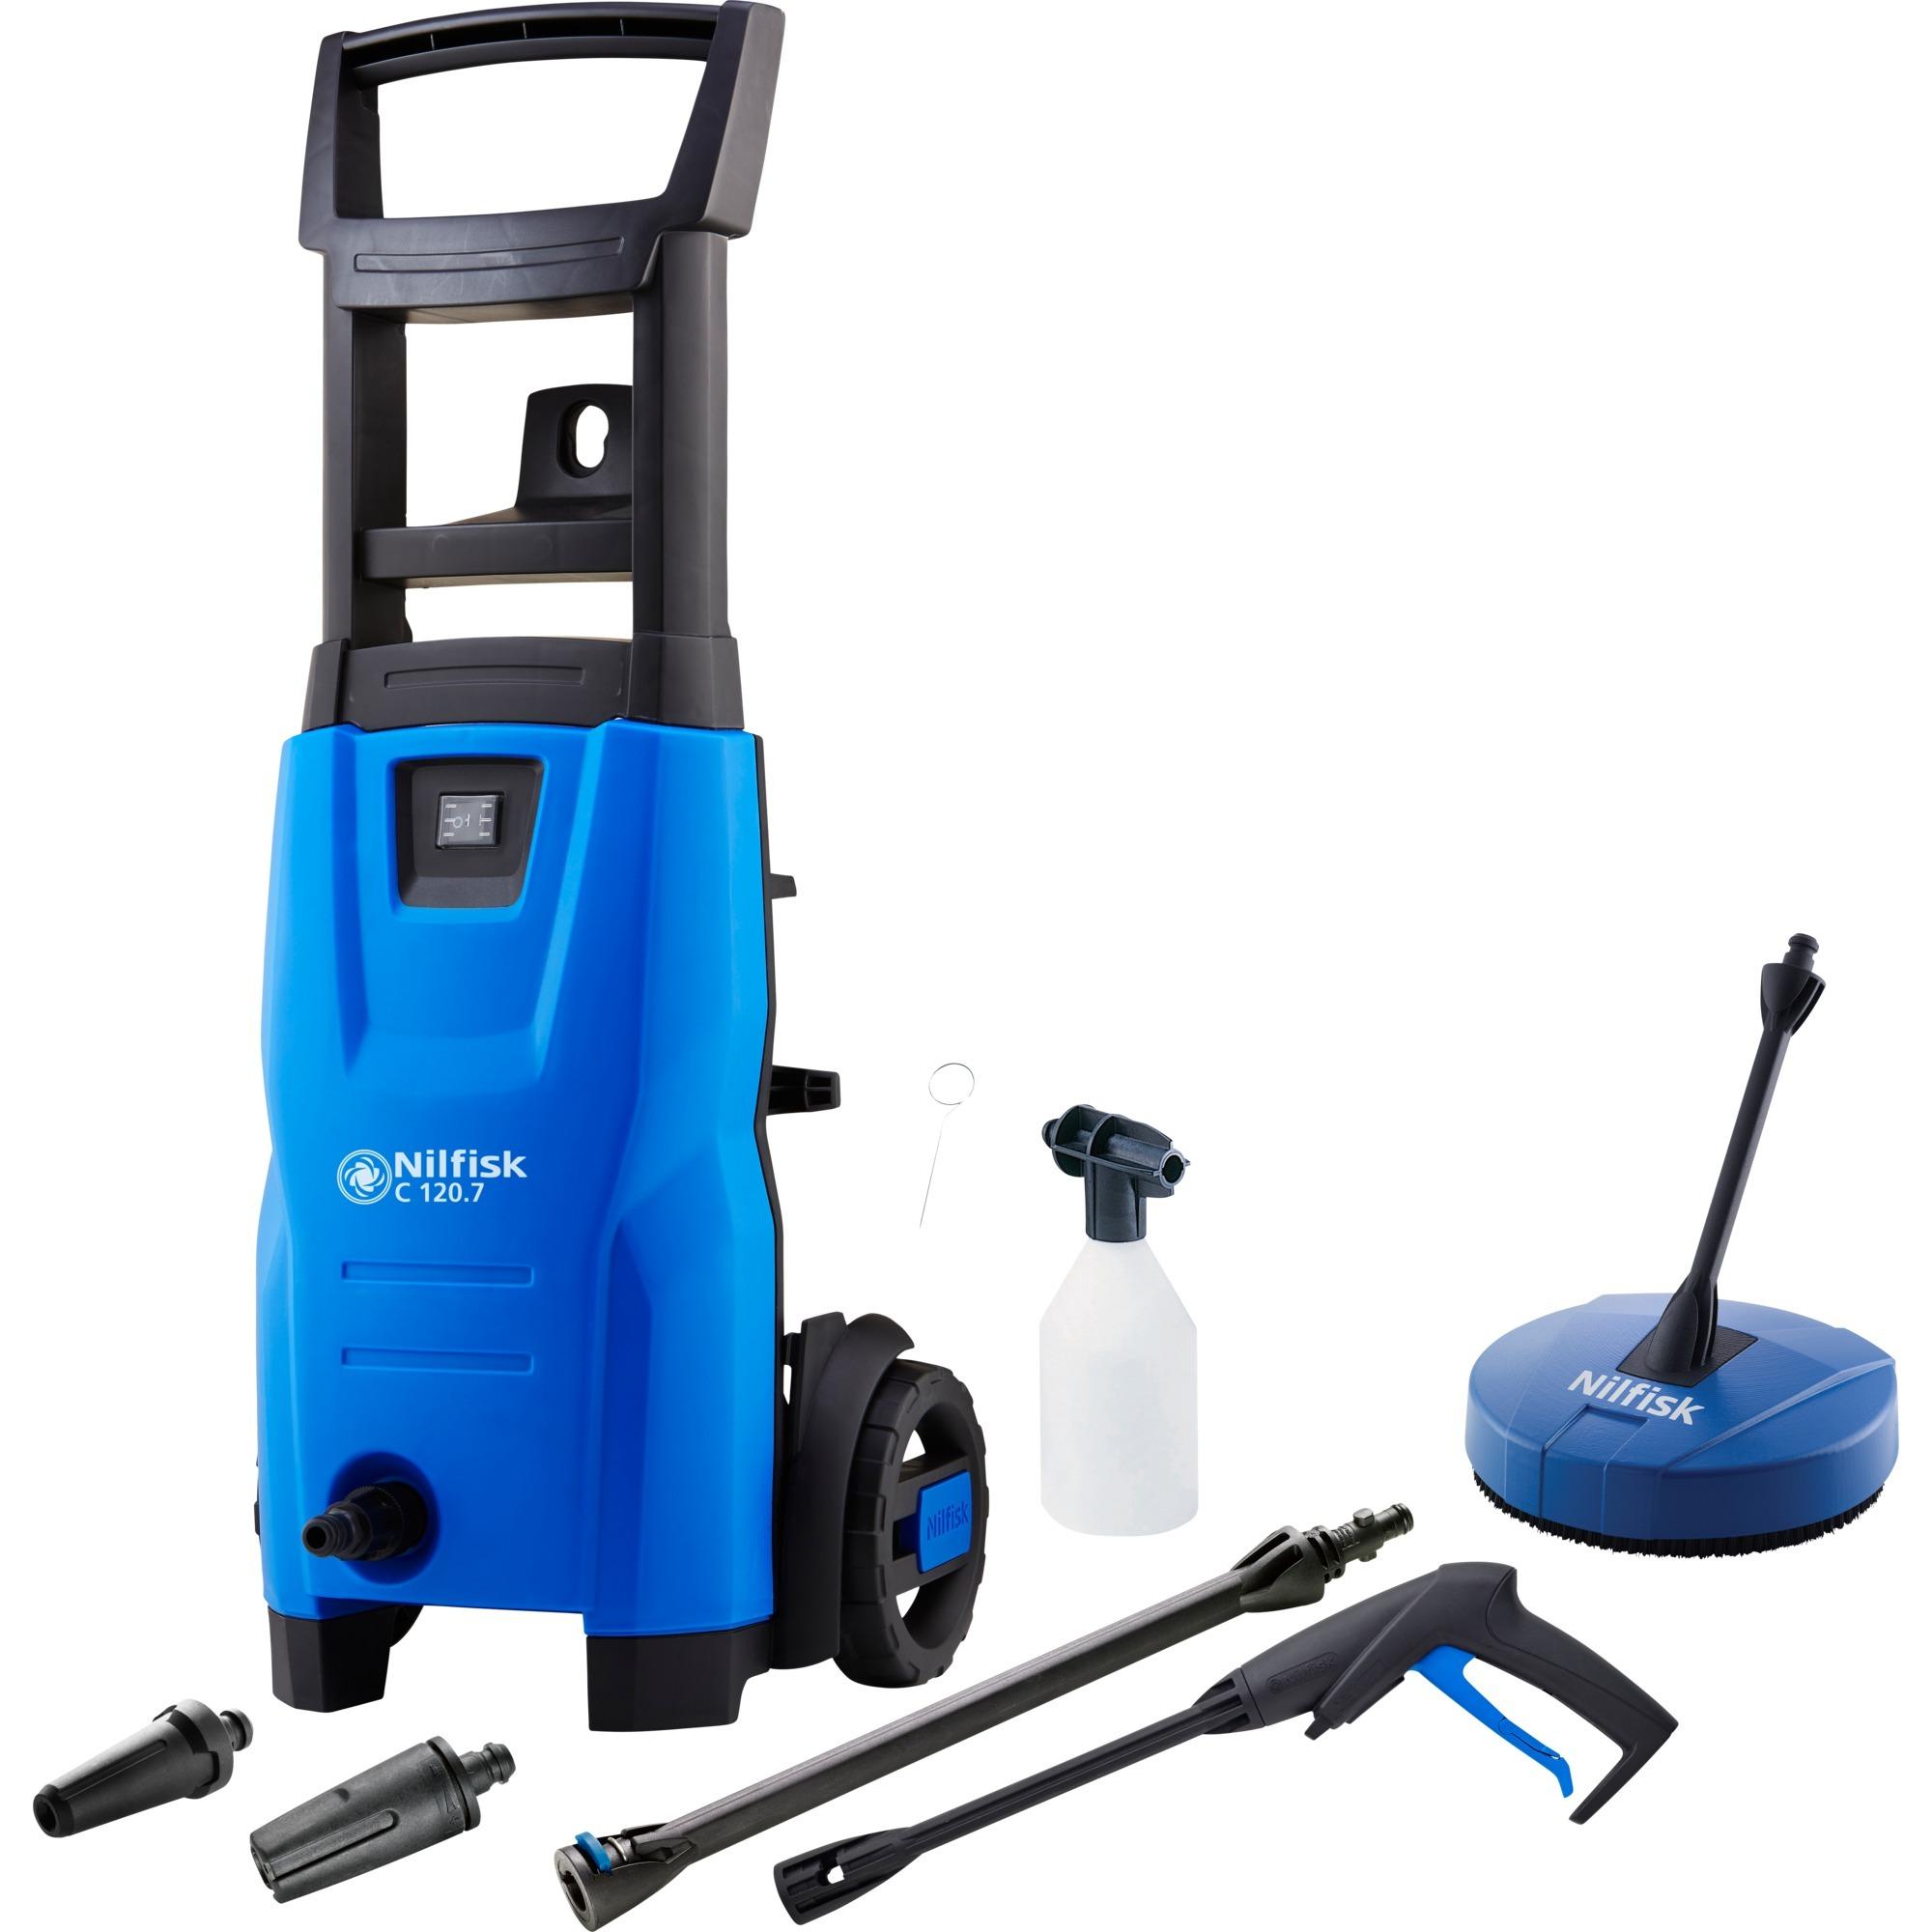 C 120.7-6 PC EU Vertical Eléctrico 440l/h 1400W Negro, Azul Limpiadora de alta presión o Hidrolimpiadora, Hidrolimpiadora de alta presión